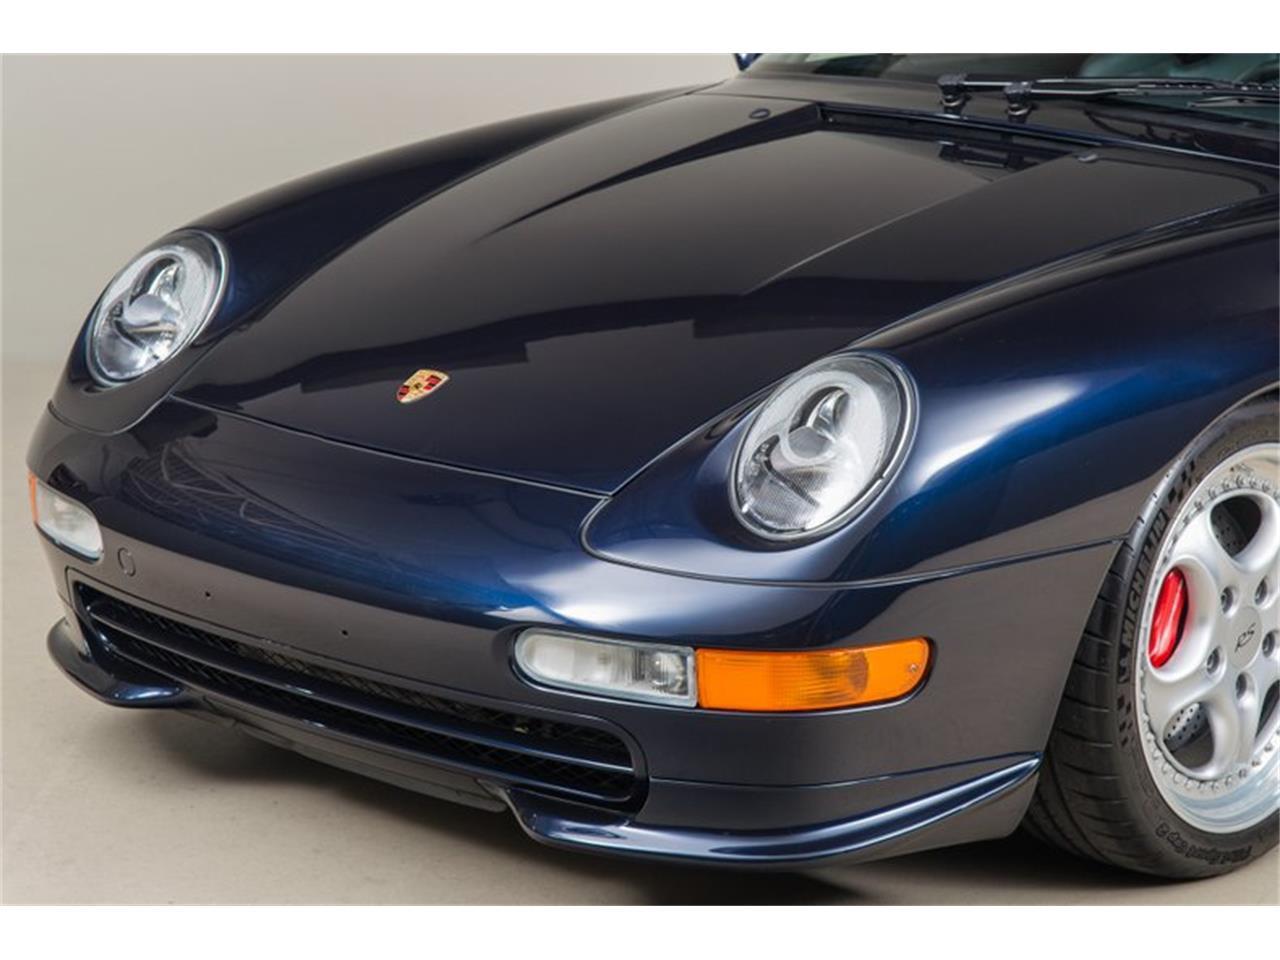 Large Picture of 1996 Porsche 911 located in California - QMX6